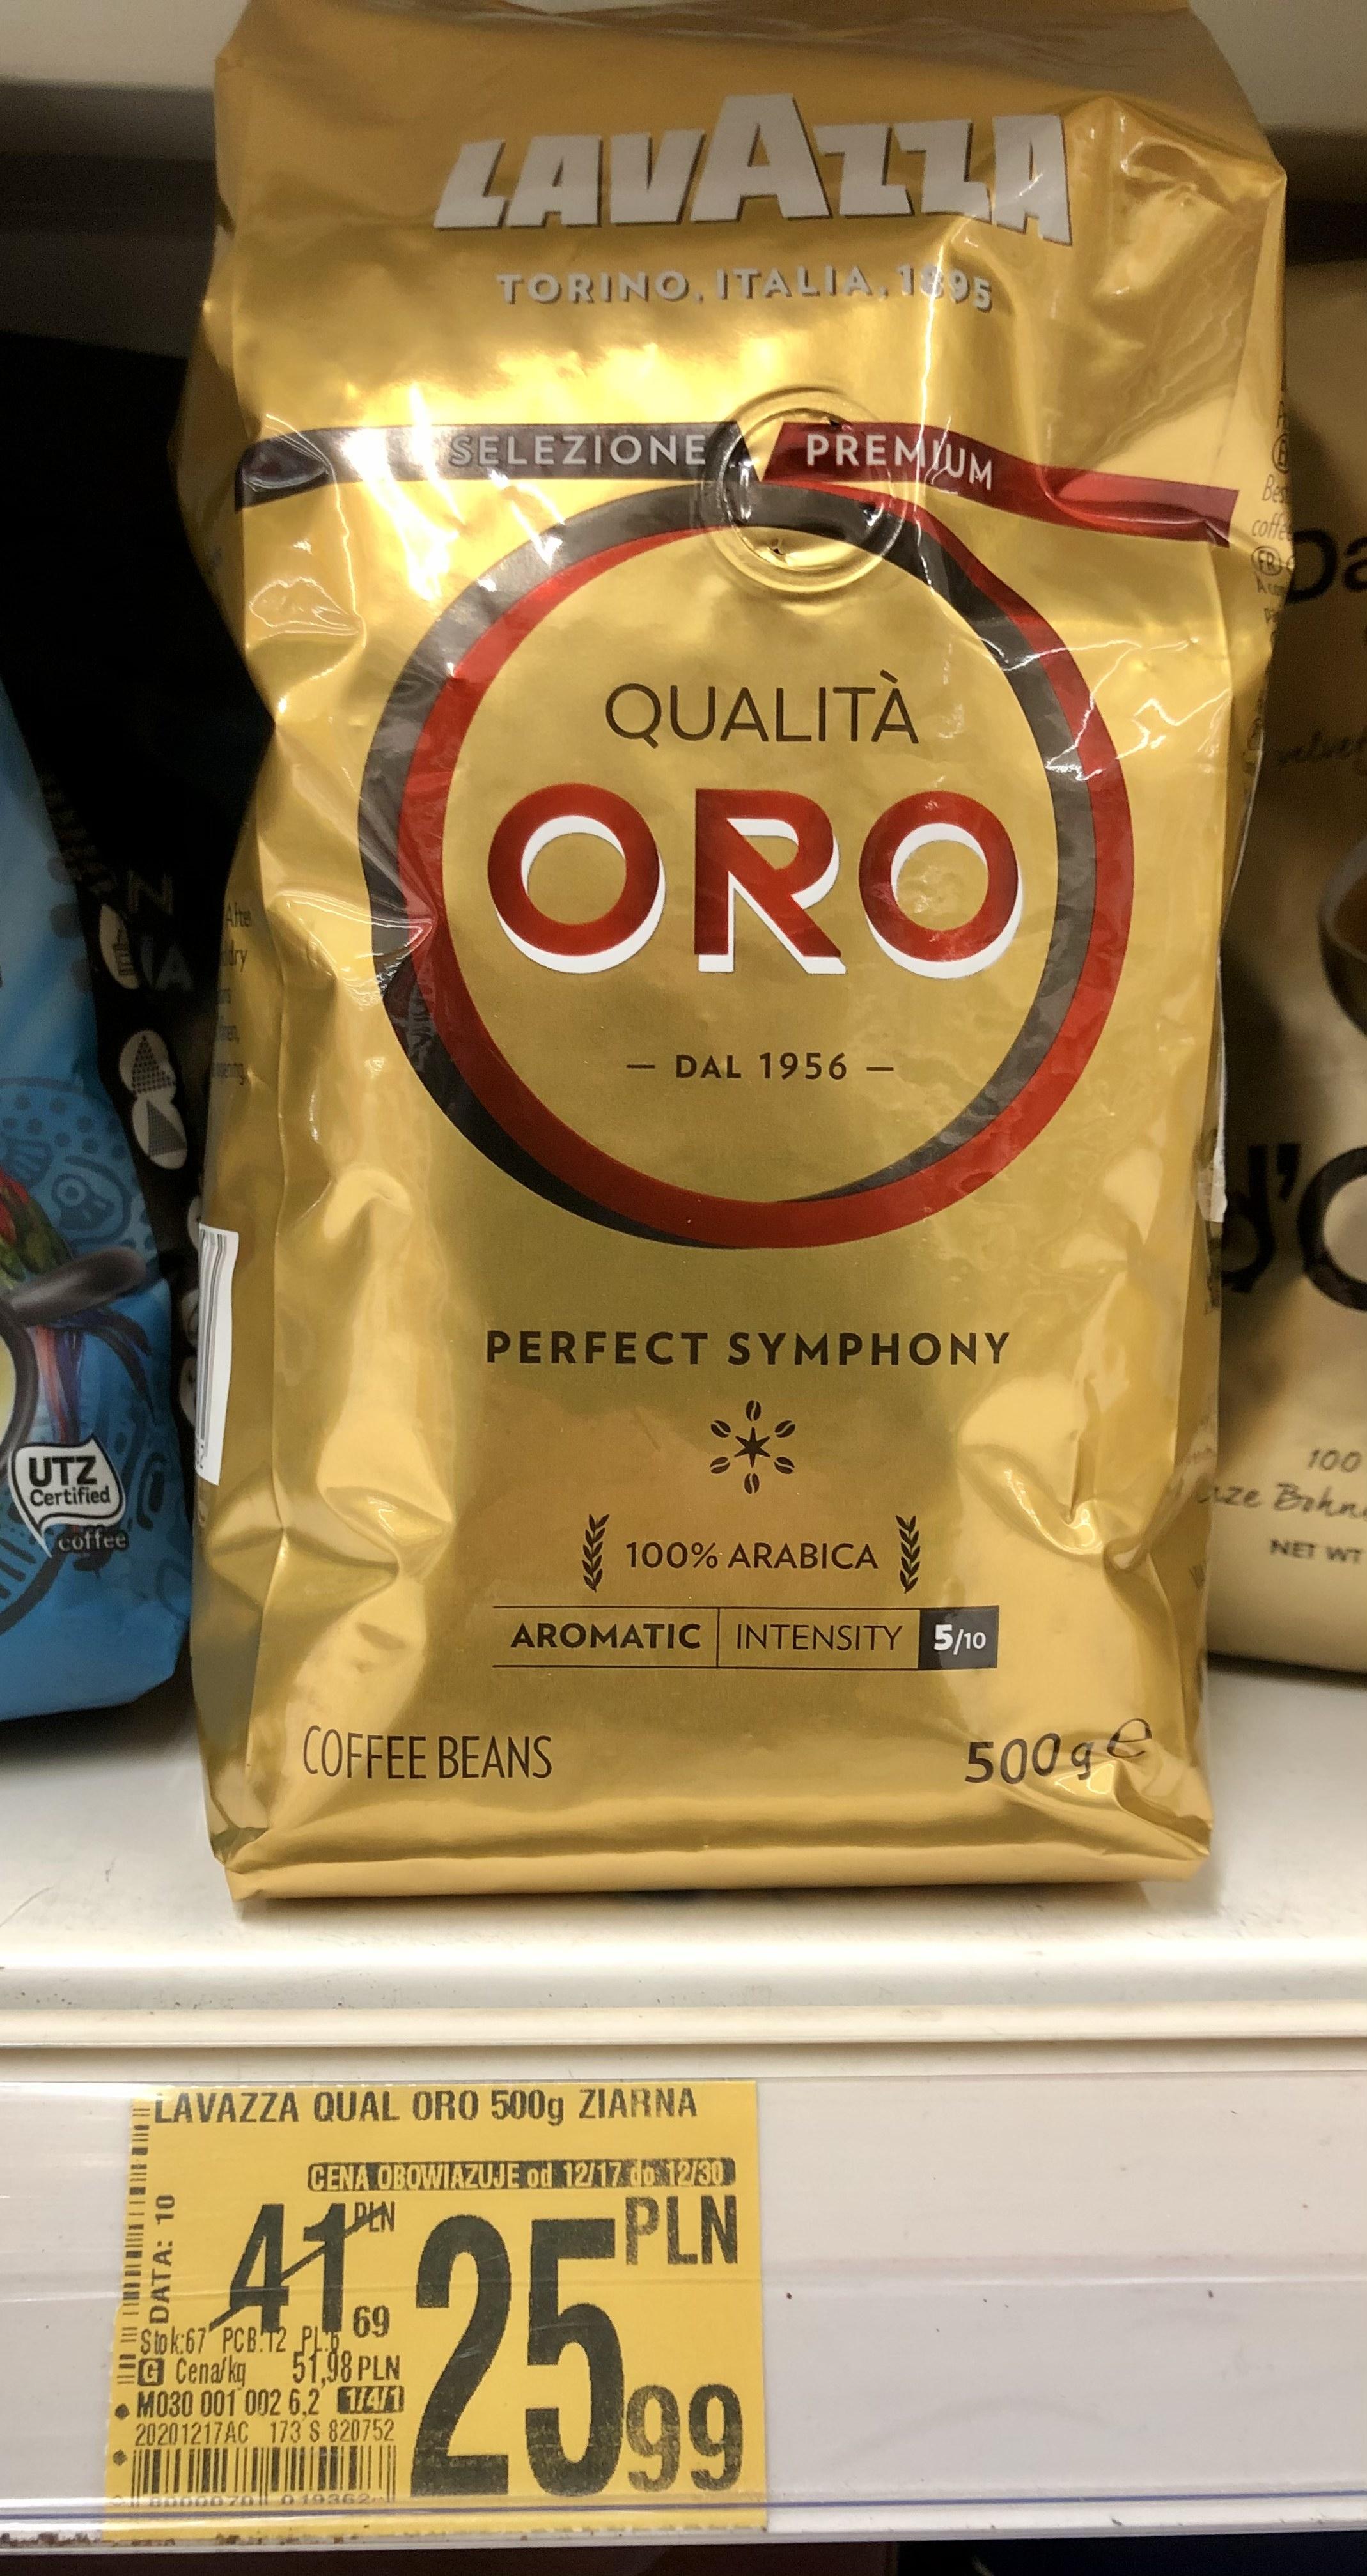 Kawa Lavazza Qualita Oro 0,5kg w dobrej cenie.